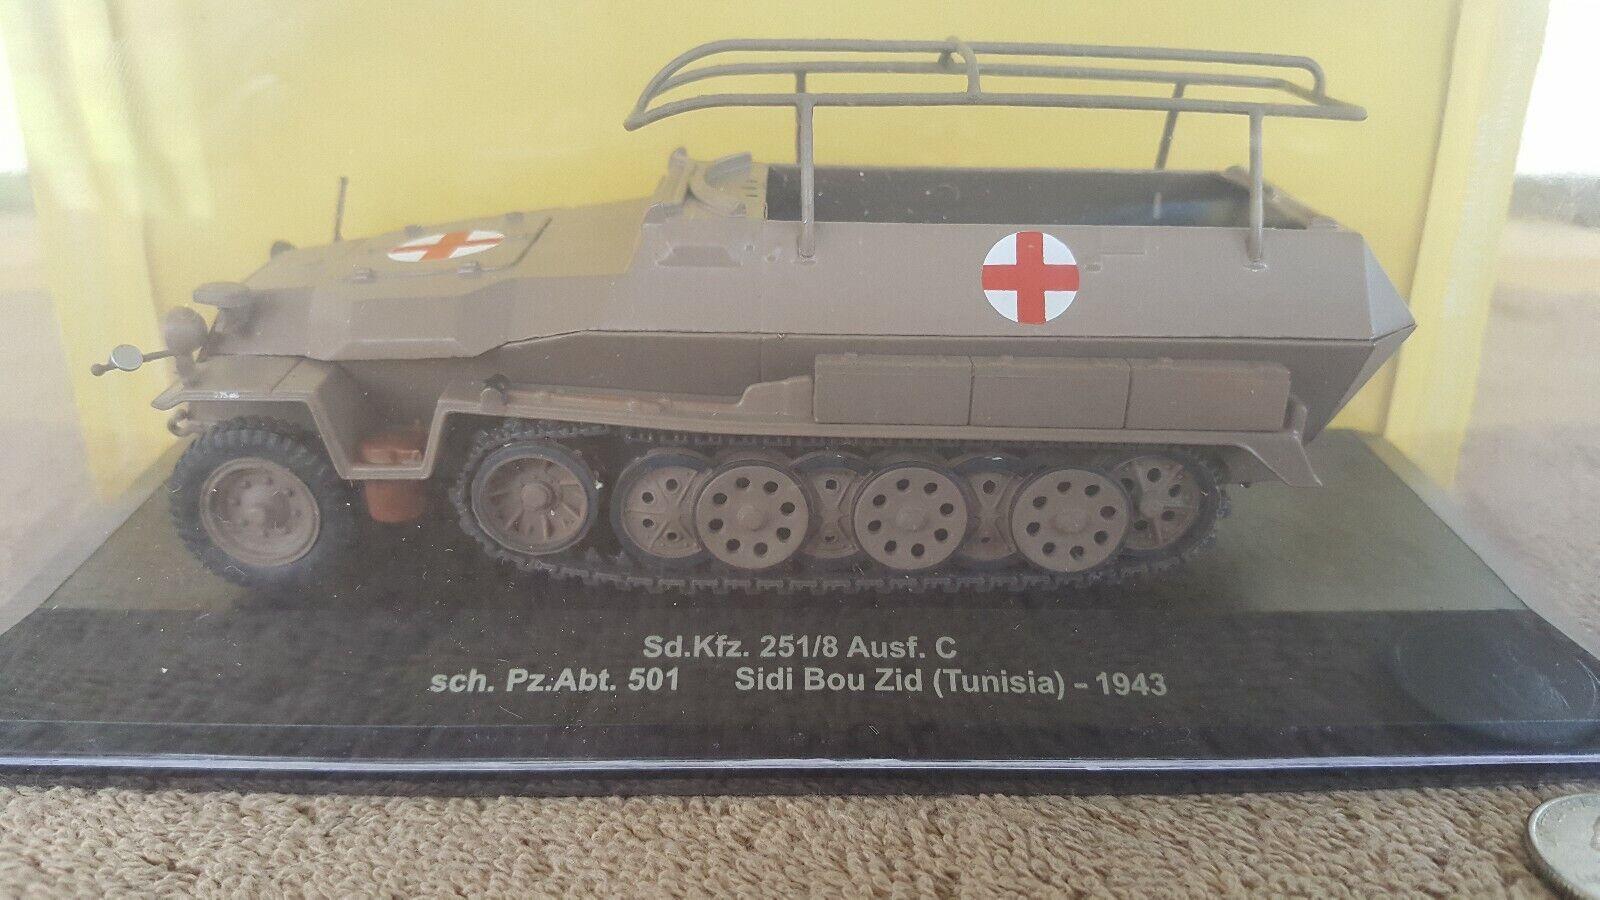 IXO MODELS Sd.Kfz251 8 Ausf.C sch.Pz.Abt.501 Sidi Bou Zid Tunisia 1943 TANK 1 43